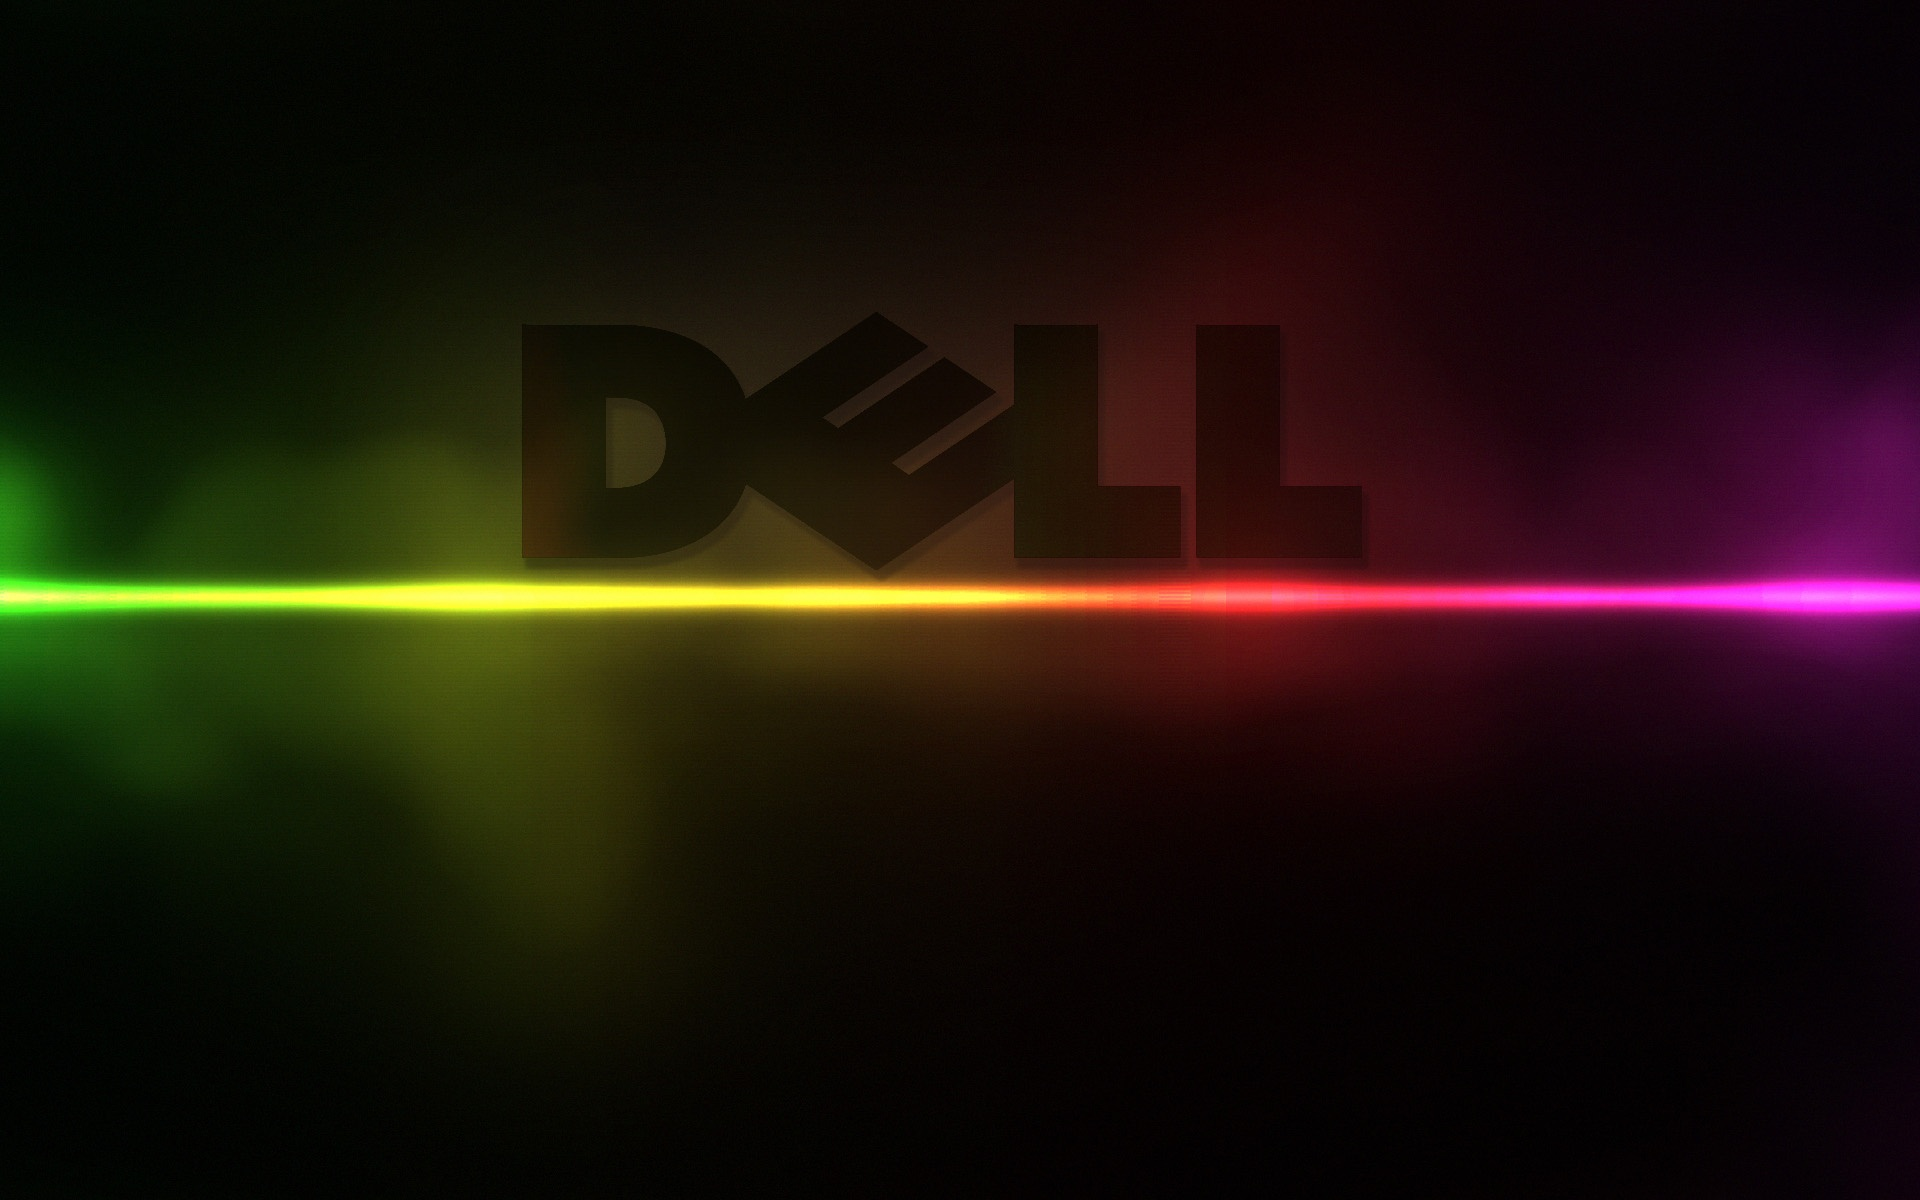 Papel De Parede Dell G3: Dell Wallpapers 24